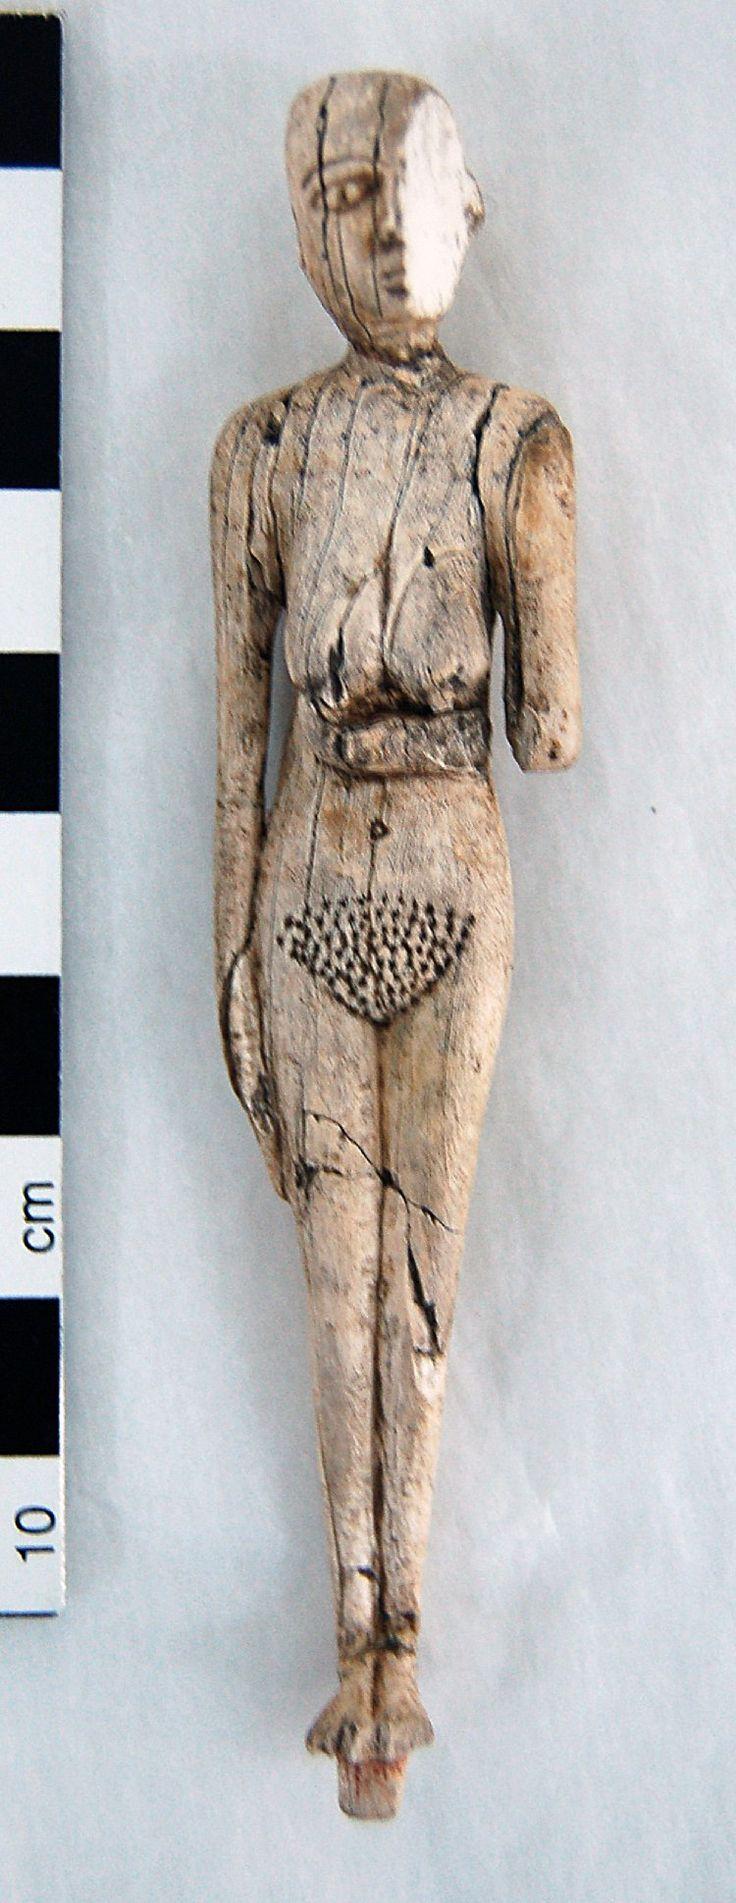 Culture/period:   Naqada I Ancient Egypt - female figure in carved bone @Clare Thompson Museum.org